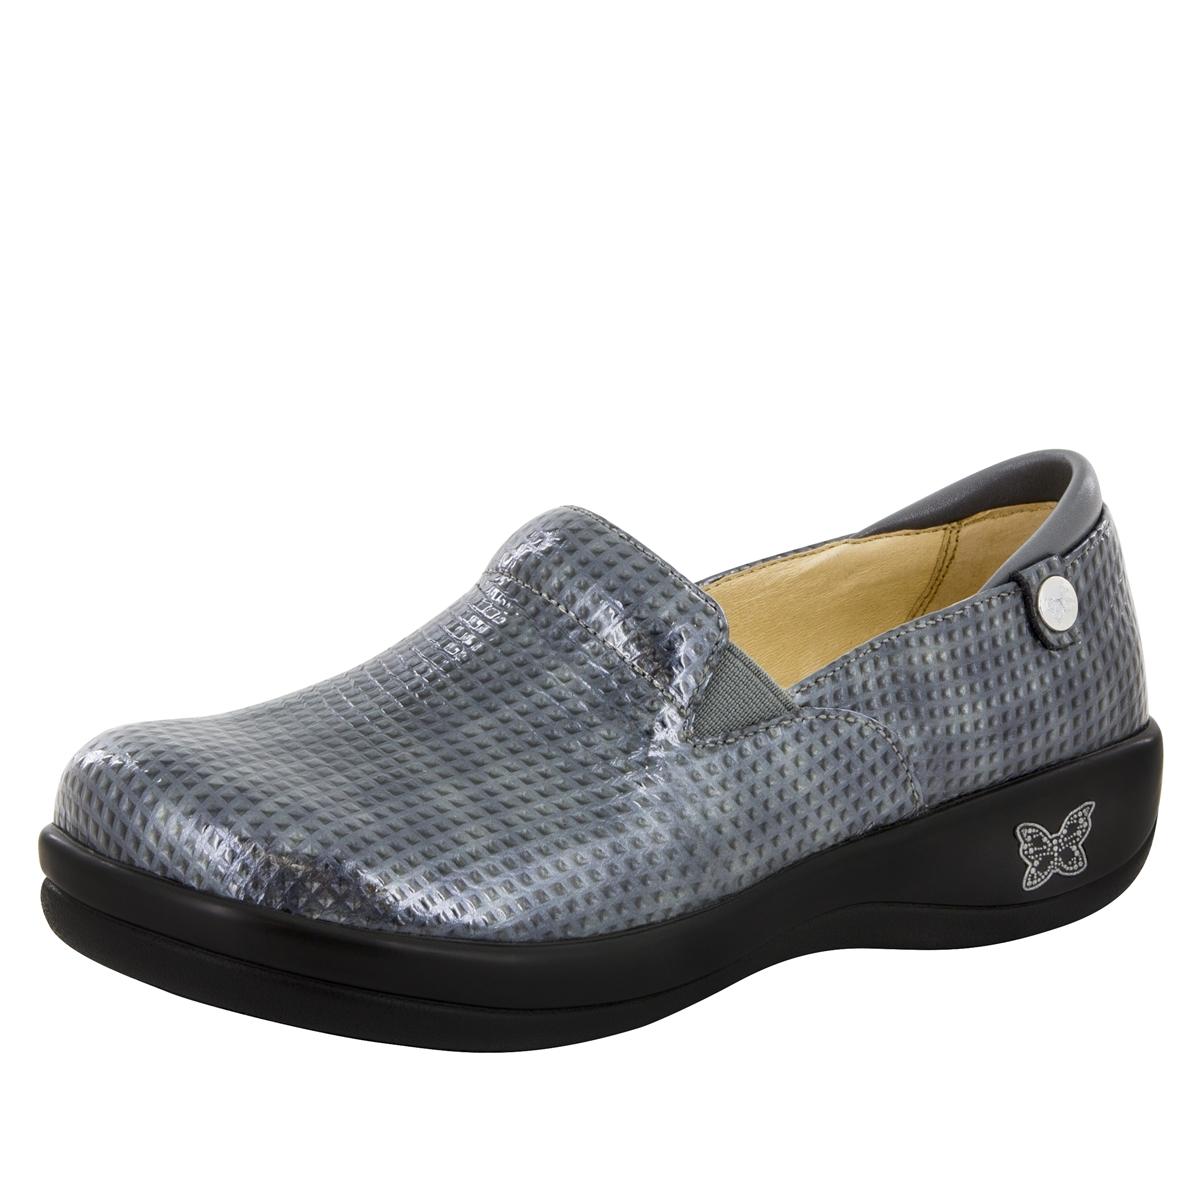 Alegria Keli PRO Chrome Cube womens comfort shoe · View Larger Photo Email  ...